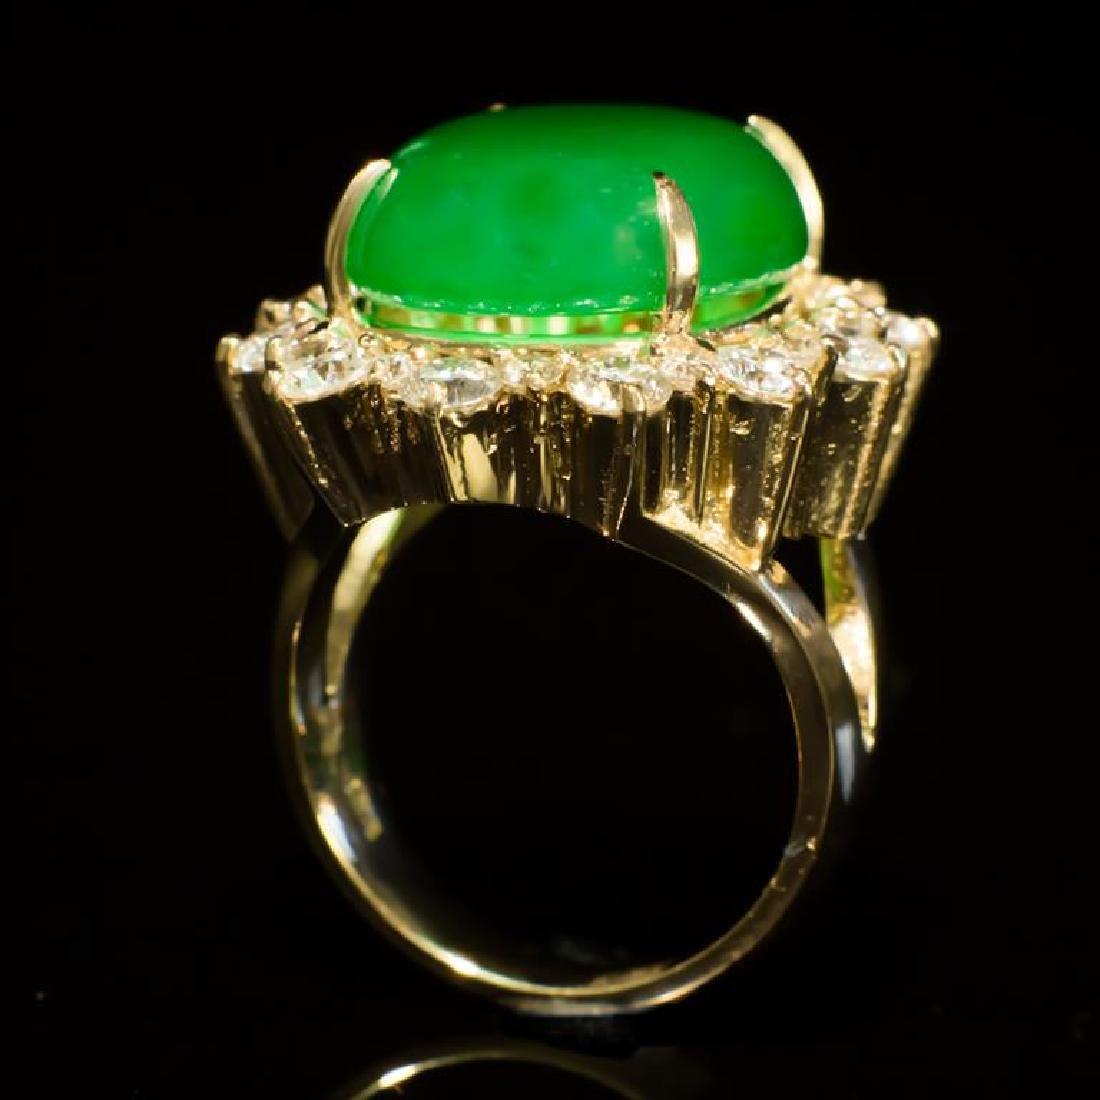 14K Gold 14.26ct Jadeite 2.41ct Diamond Ring - 3